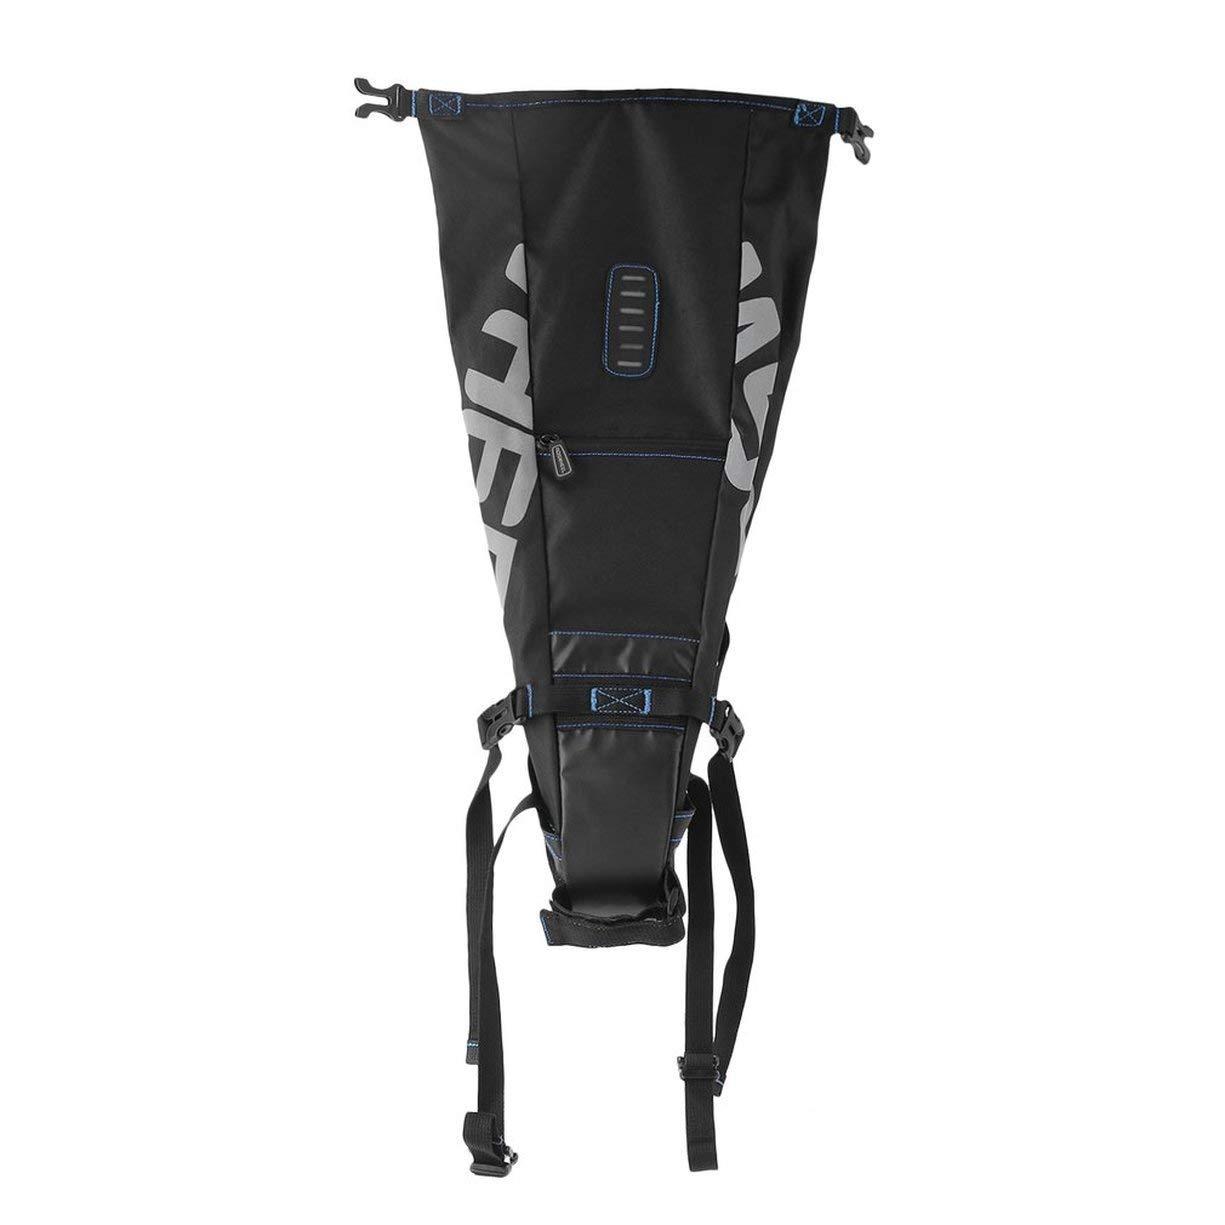 Detectoy ROSWHEEL Attack Series Waterproof Bicycle Bike Bag Accessories Saddle Bag Cycling Front Frame Bag 121370